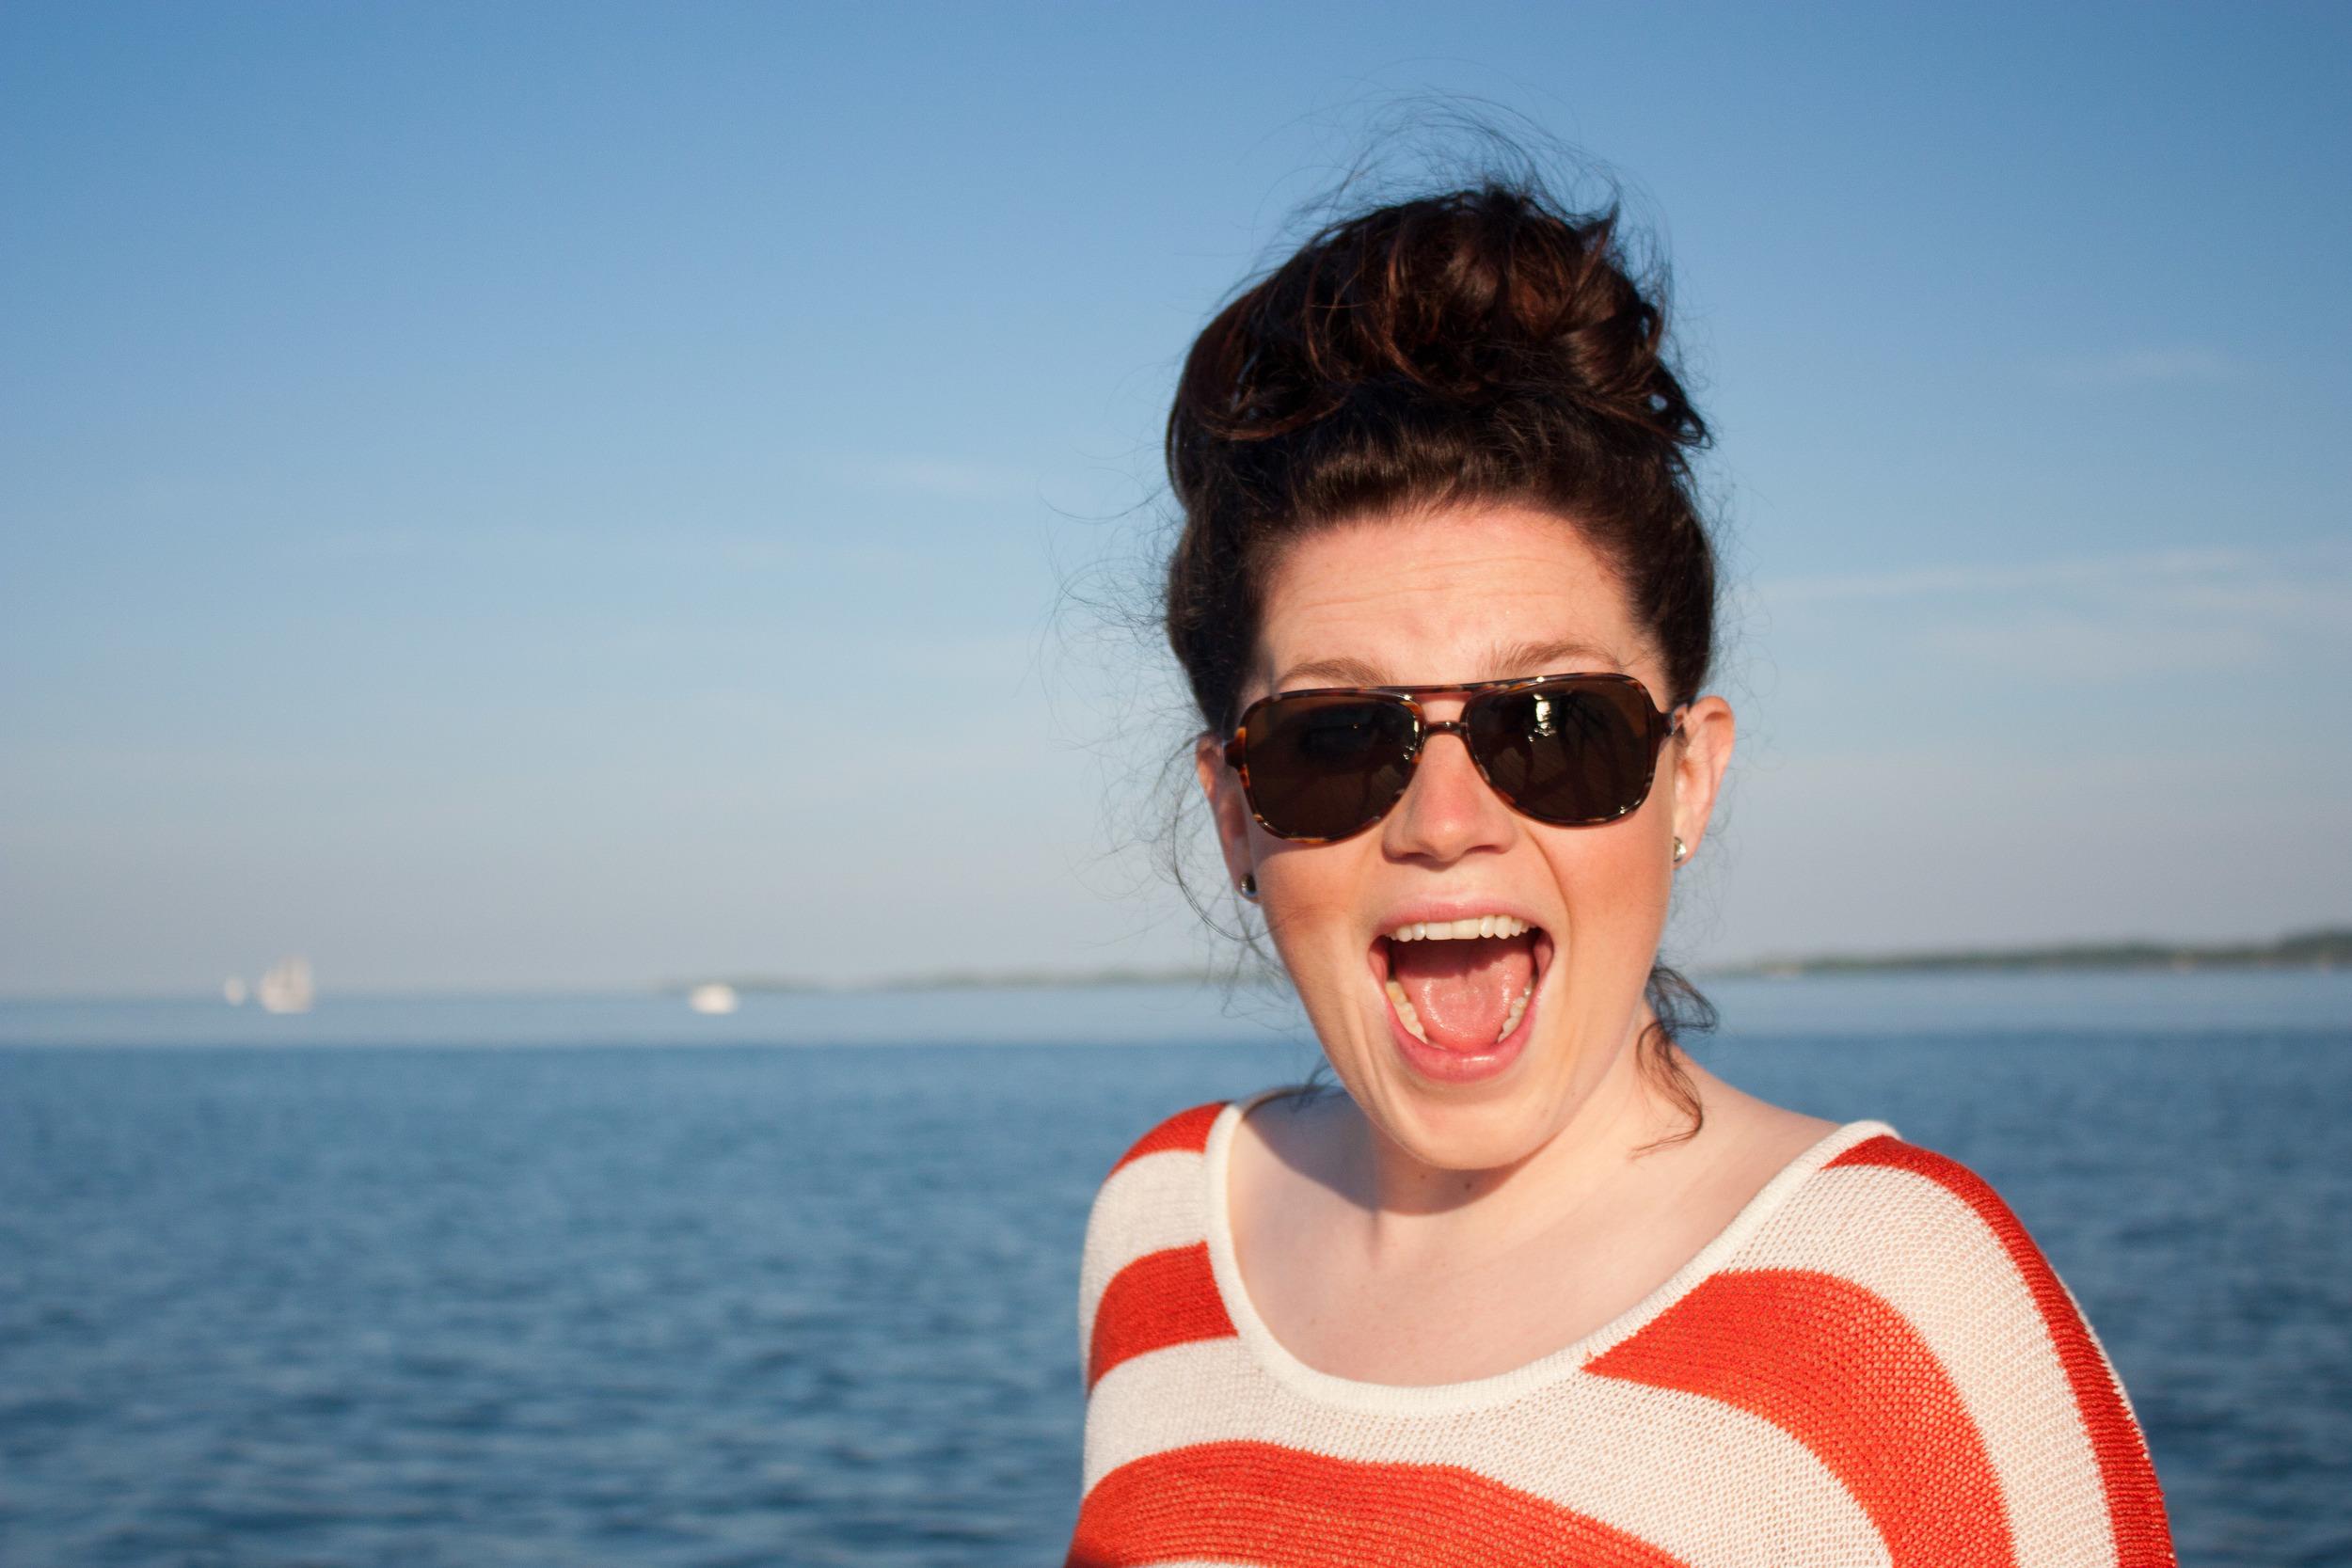 sarah-see-their-world-alue-optics-sunglasses.jpg